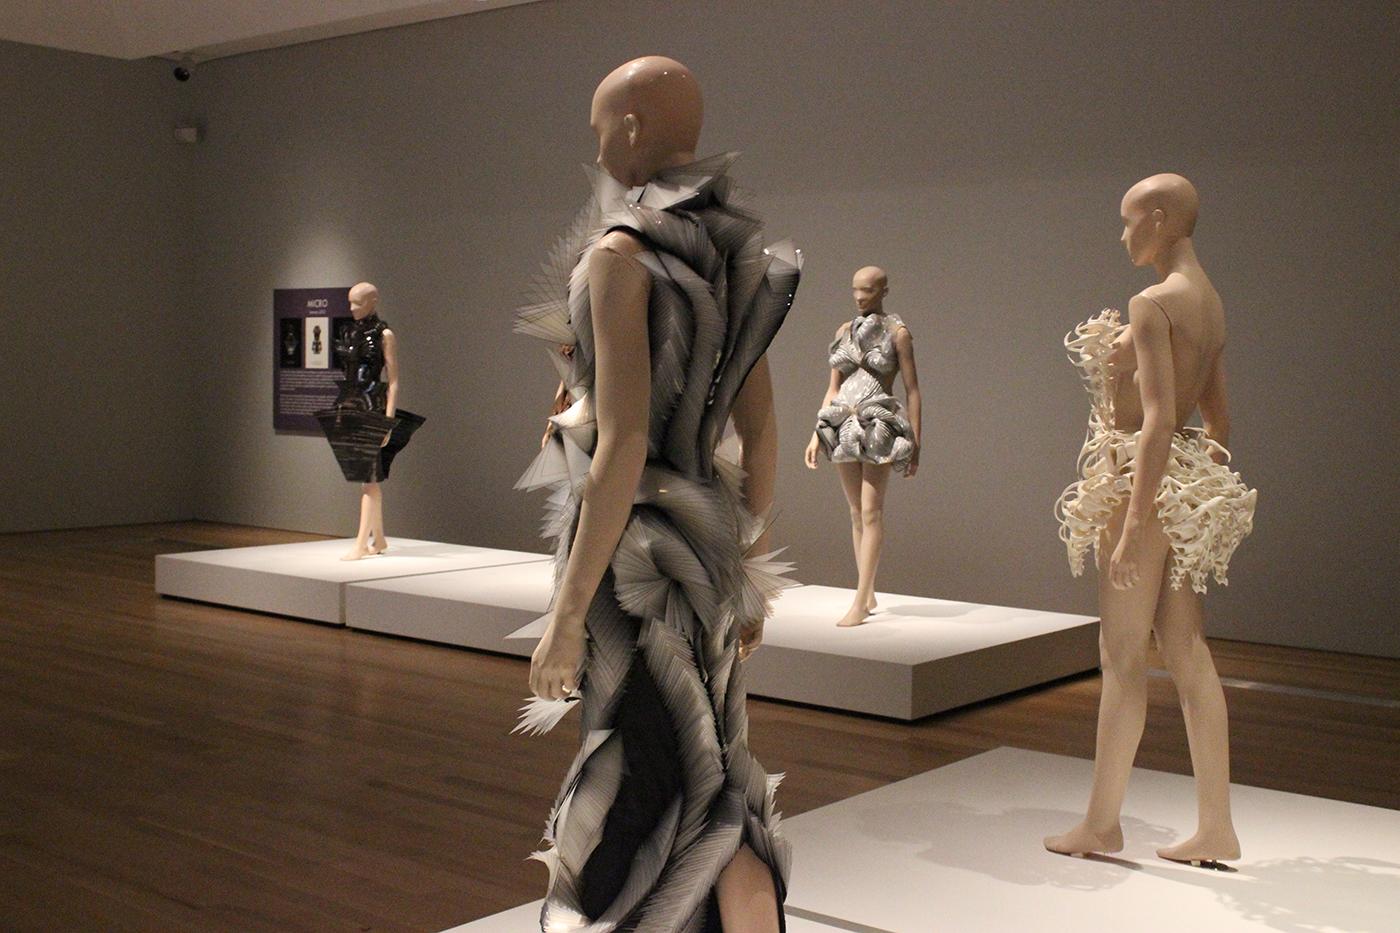 Iris Van Herpen Makes A Case For Fashion As Fine Art Auto Kk2 1hc Wiring Diagram